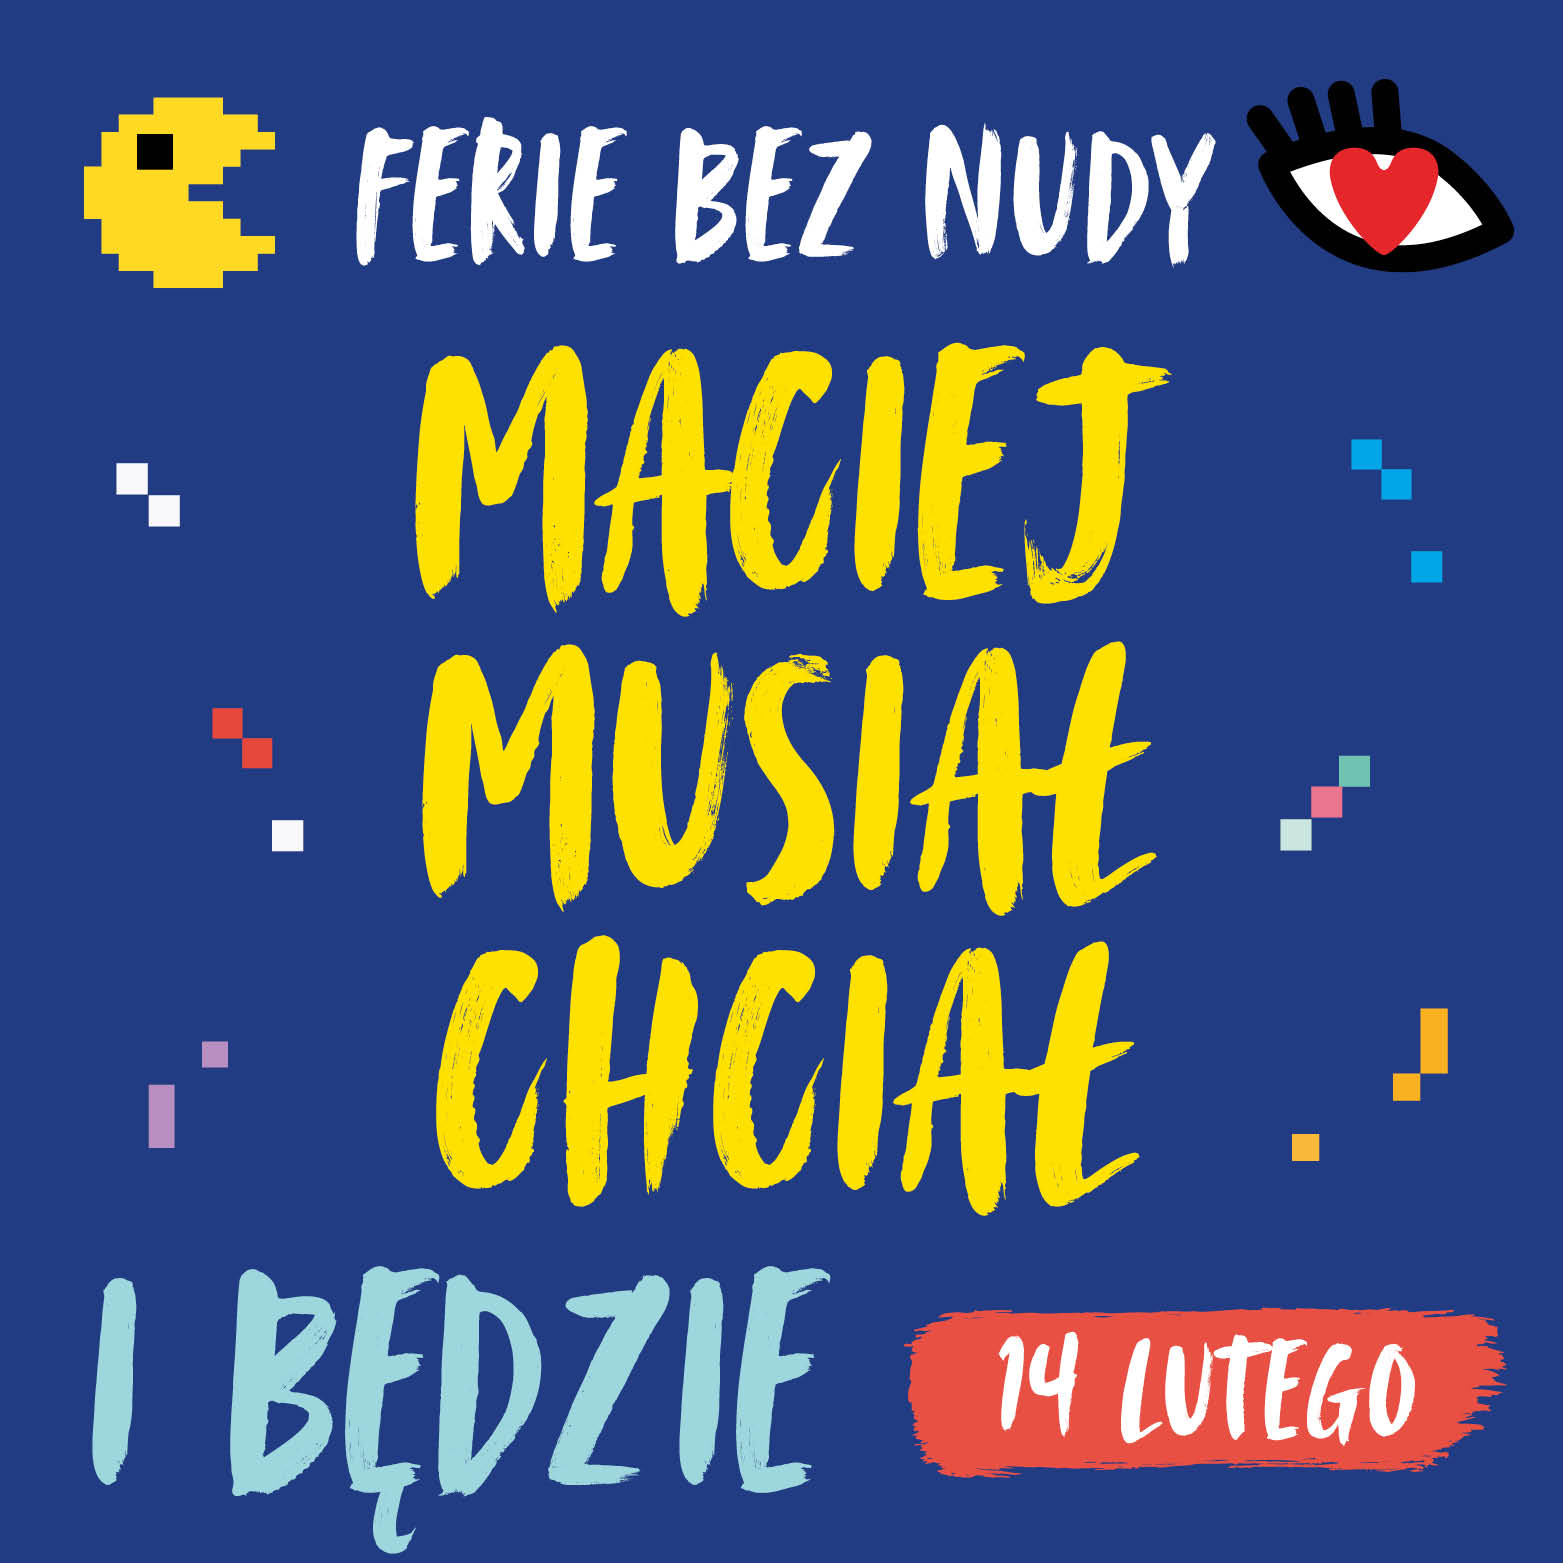 Maciej Musiał will come around for winter holidays to Libero!